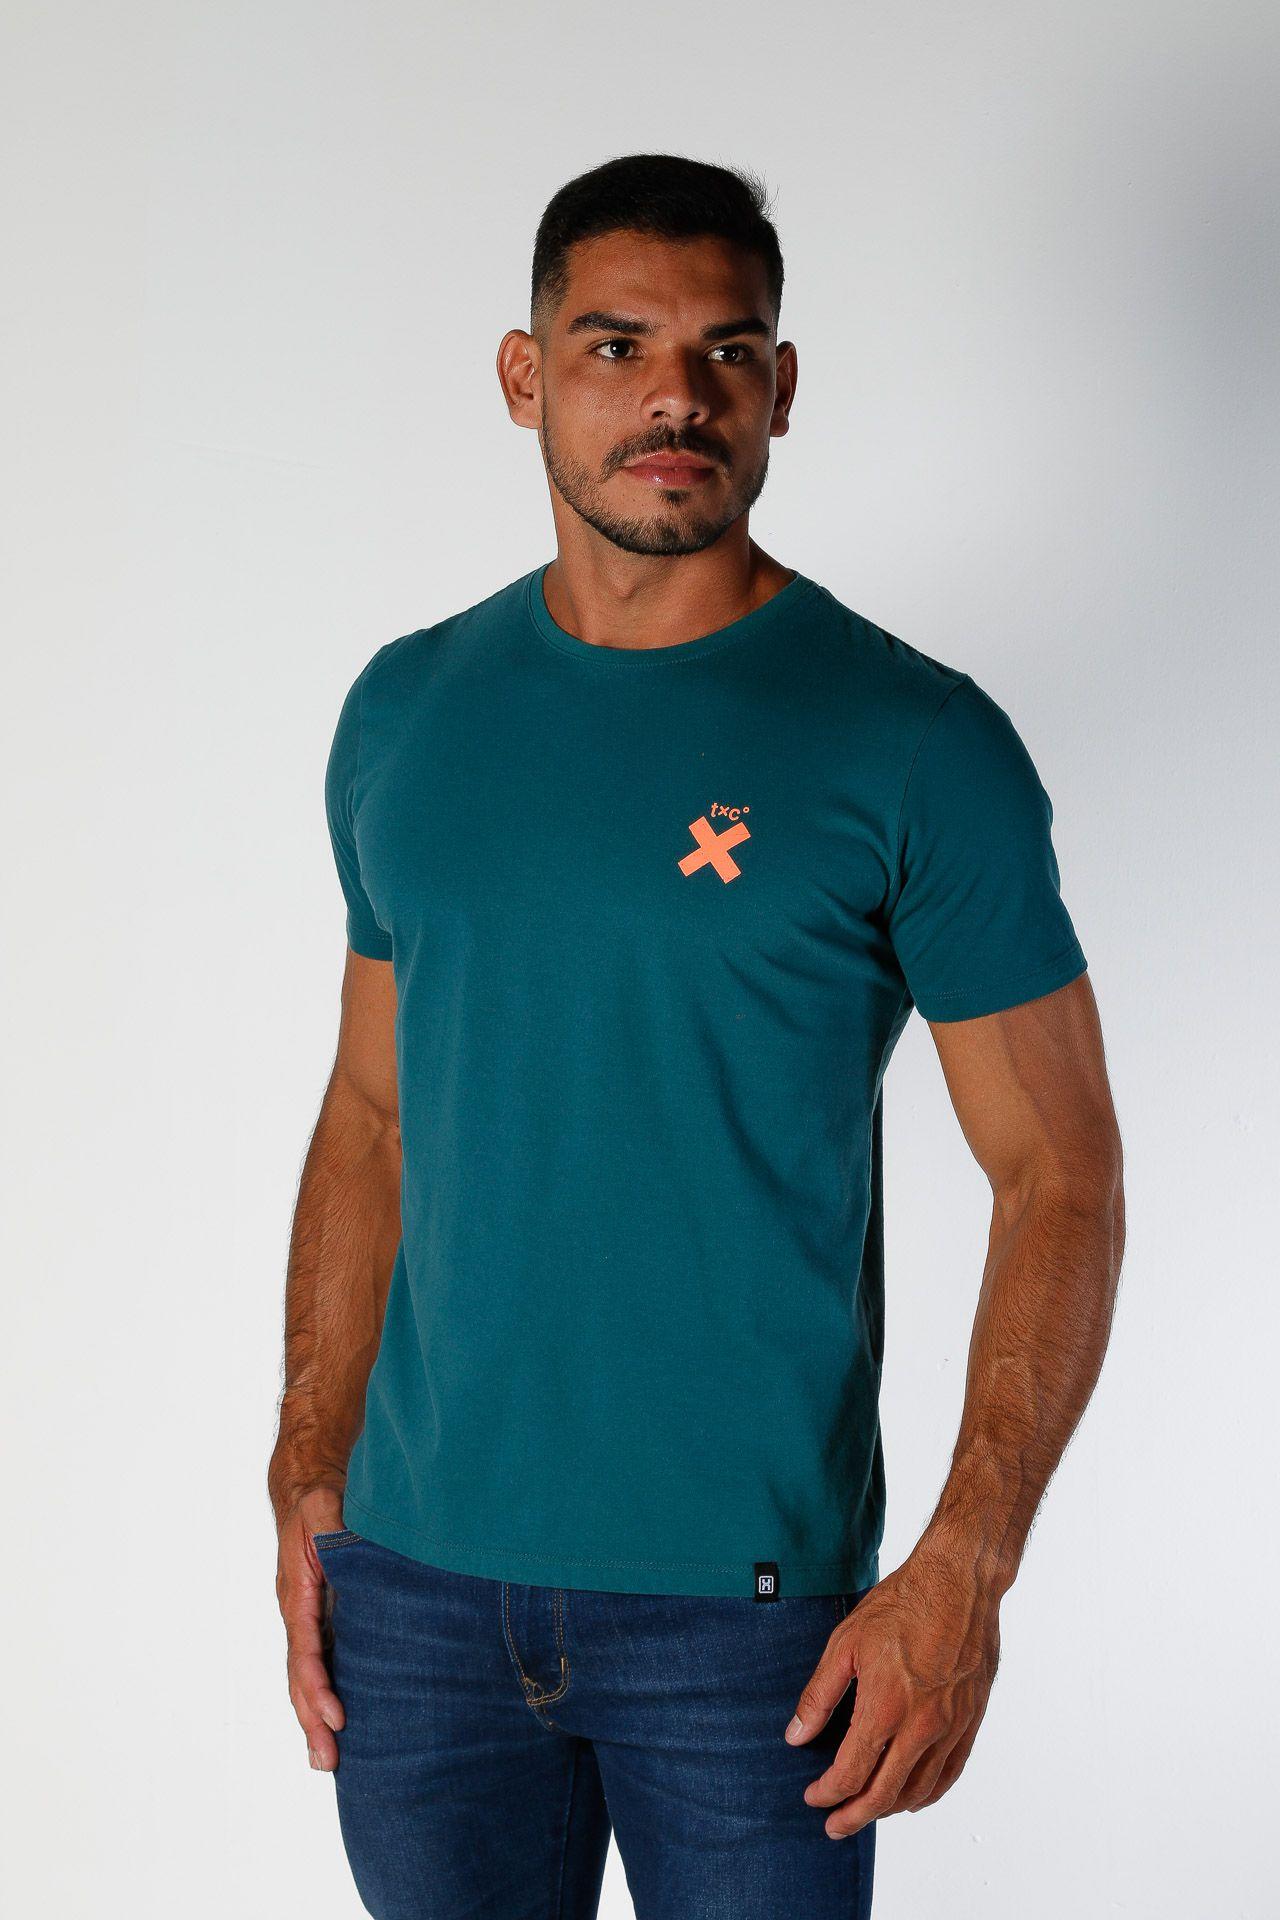 Camiseta Masculina TXC 1715